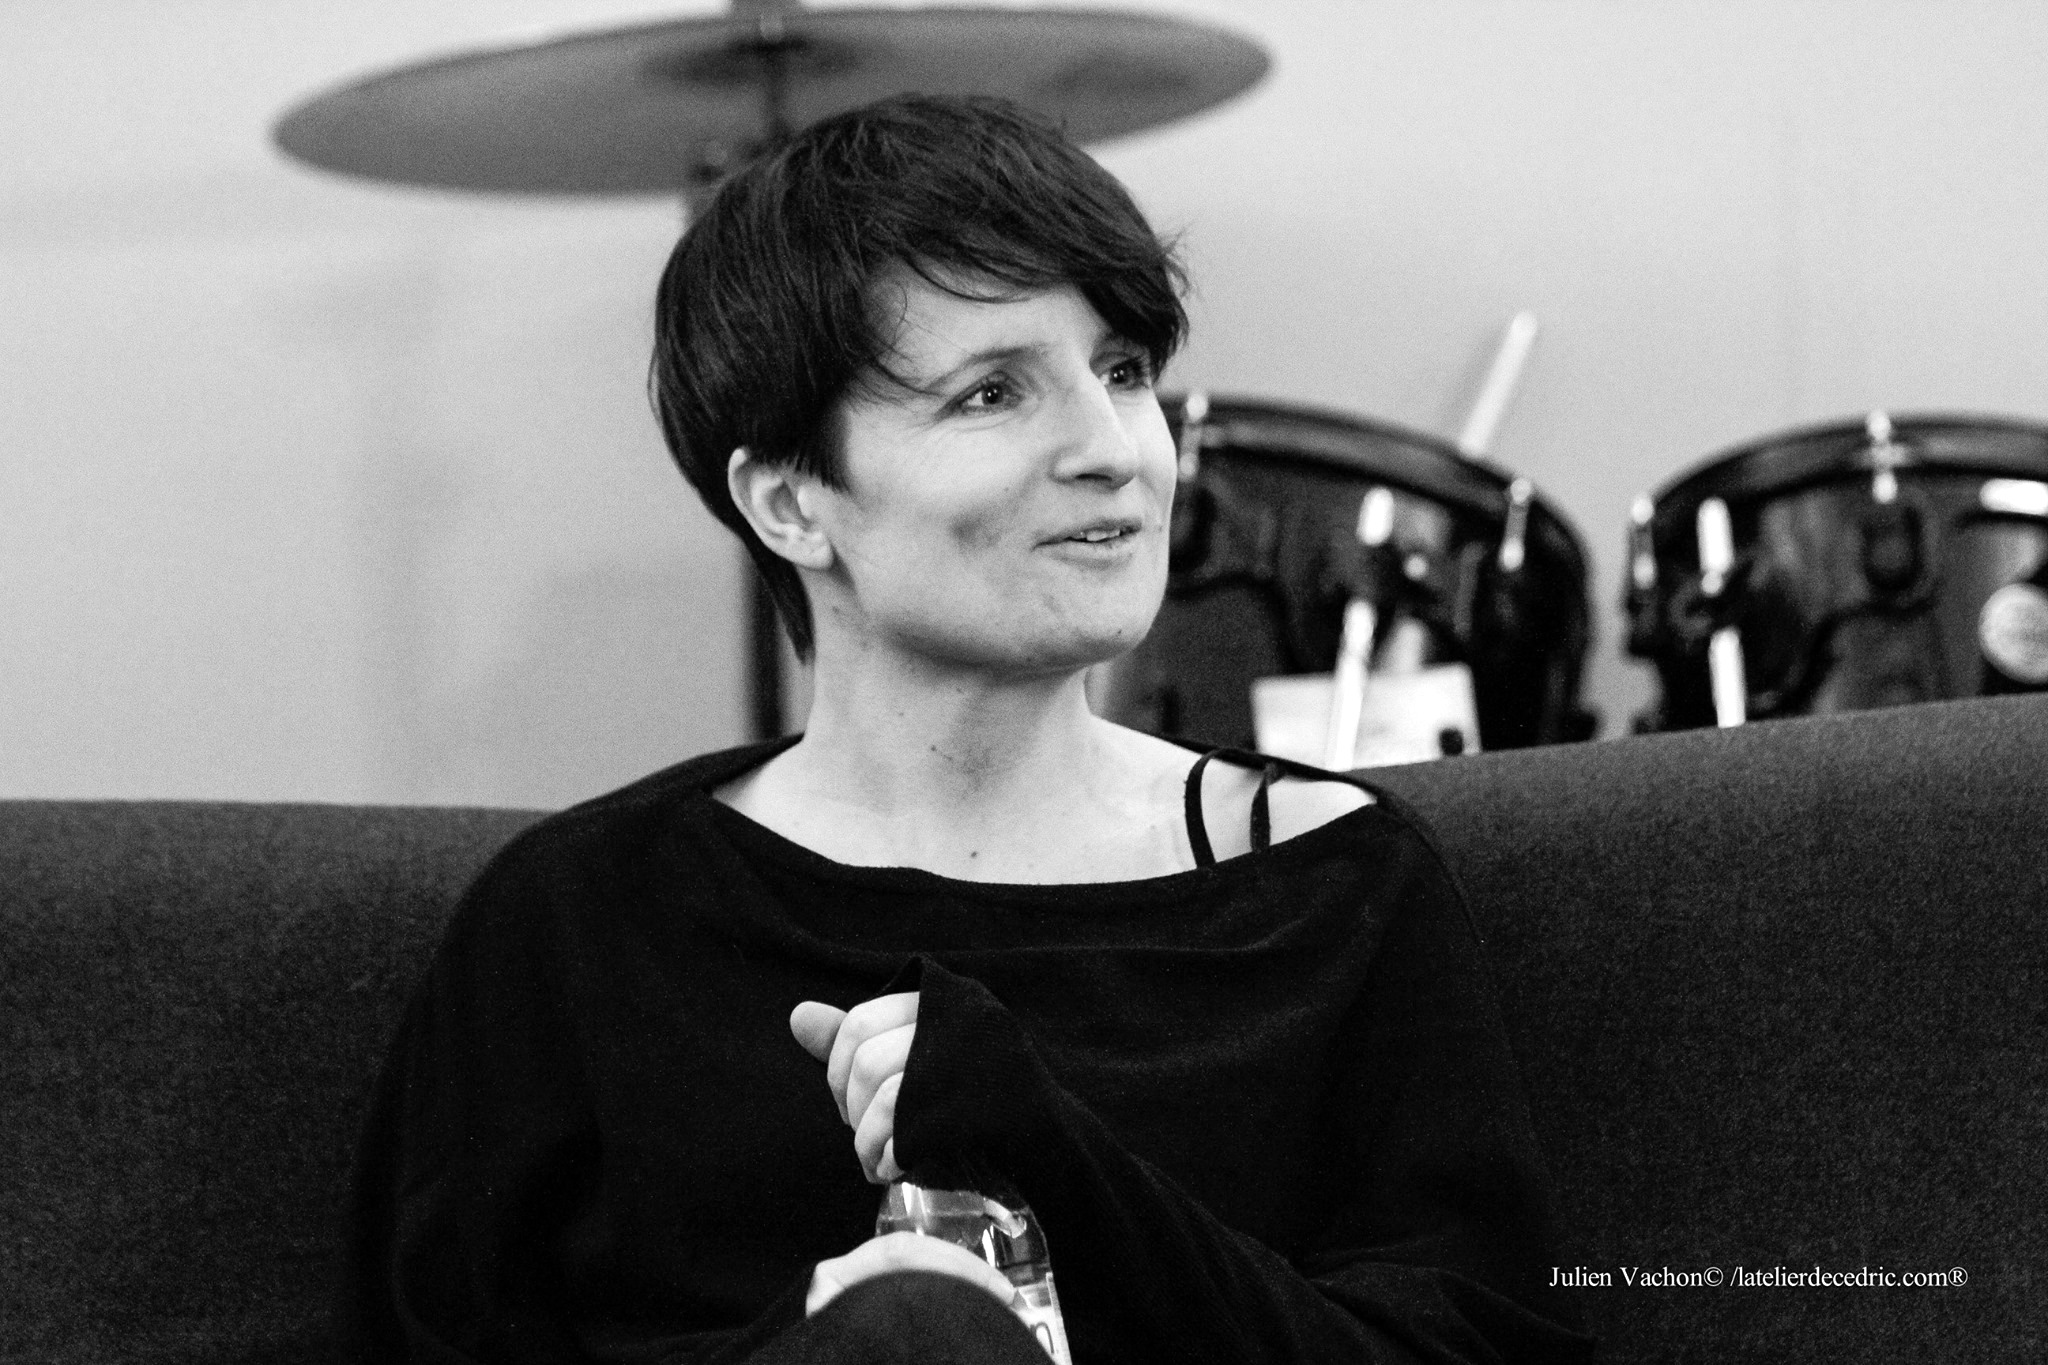 Anne-Laure Degasne